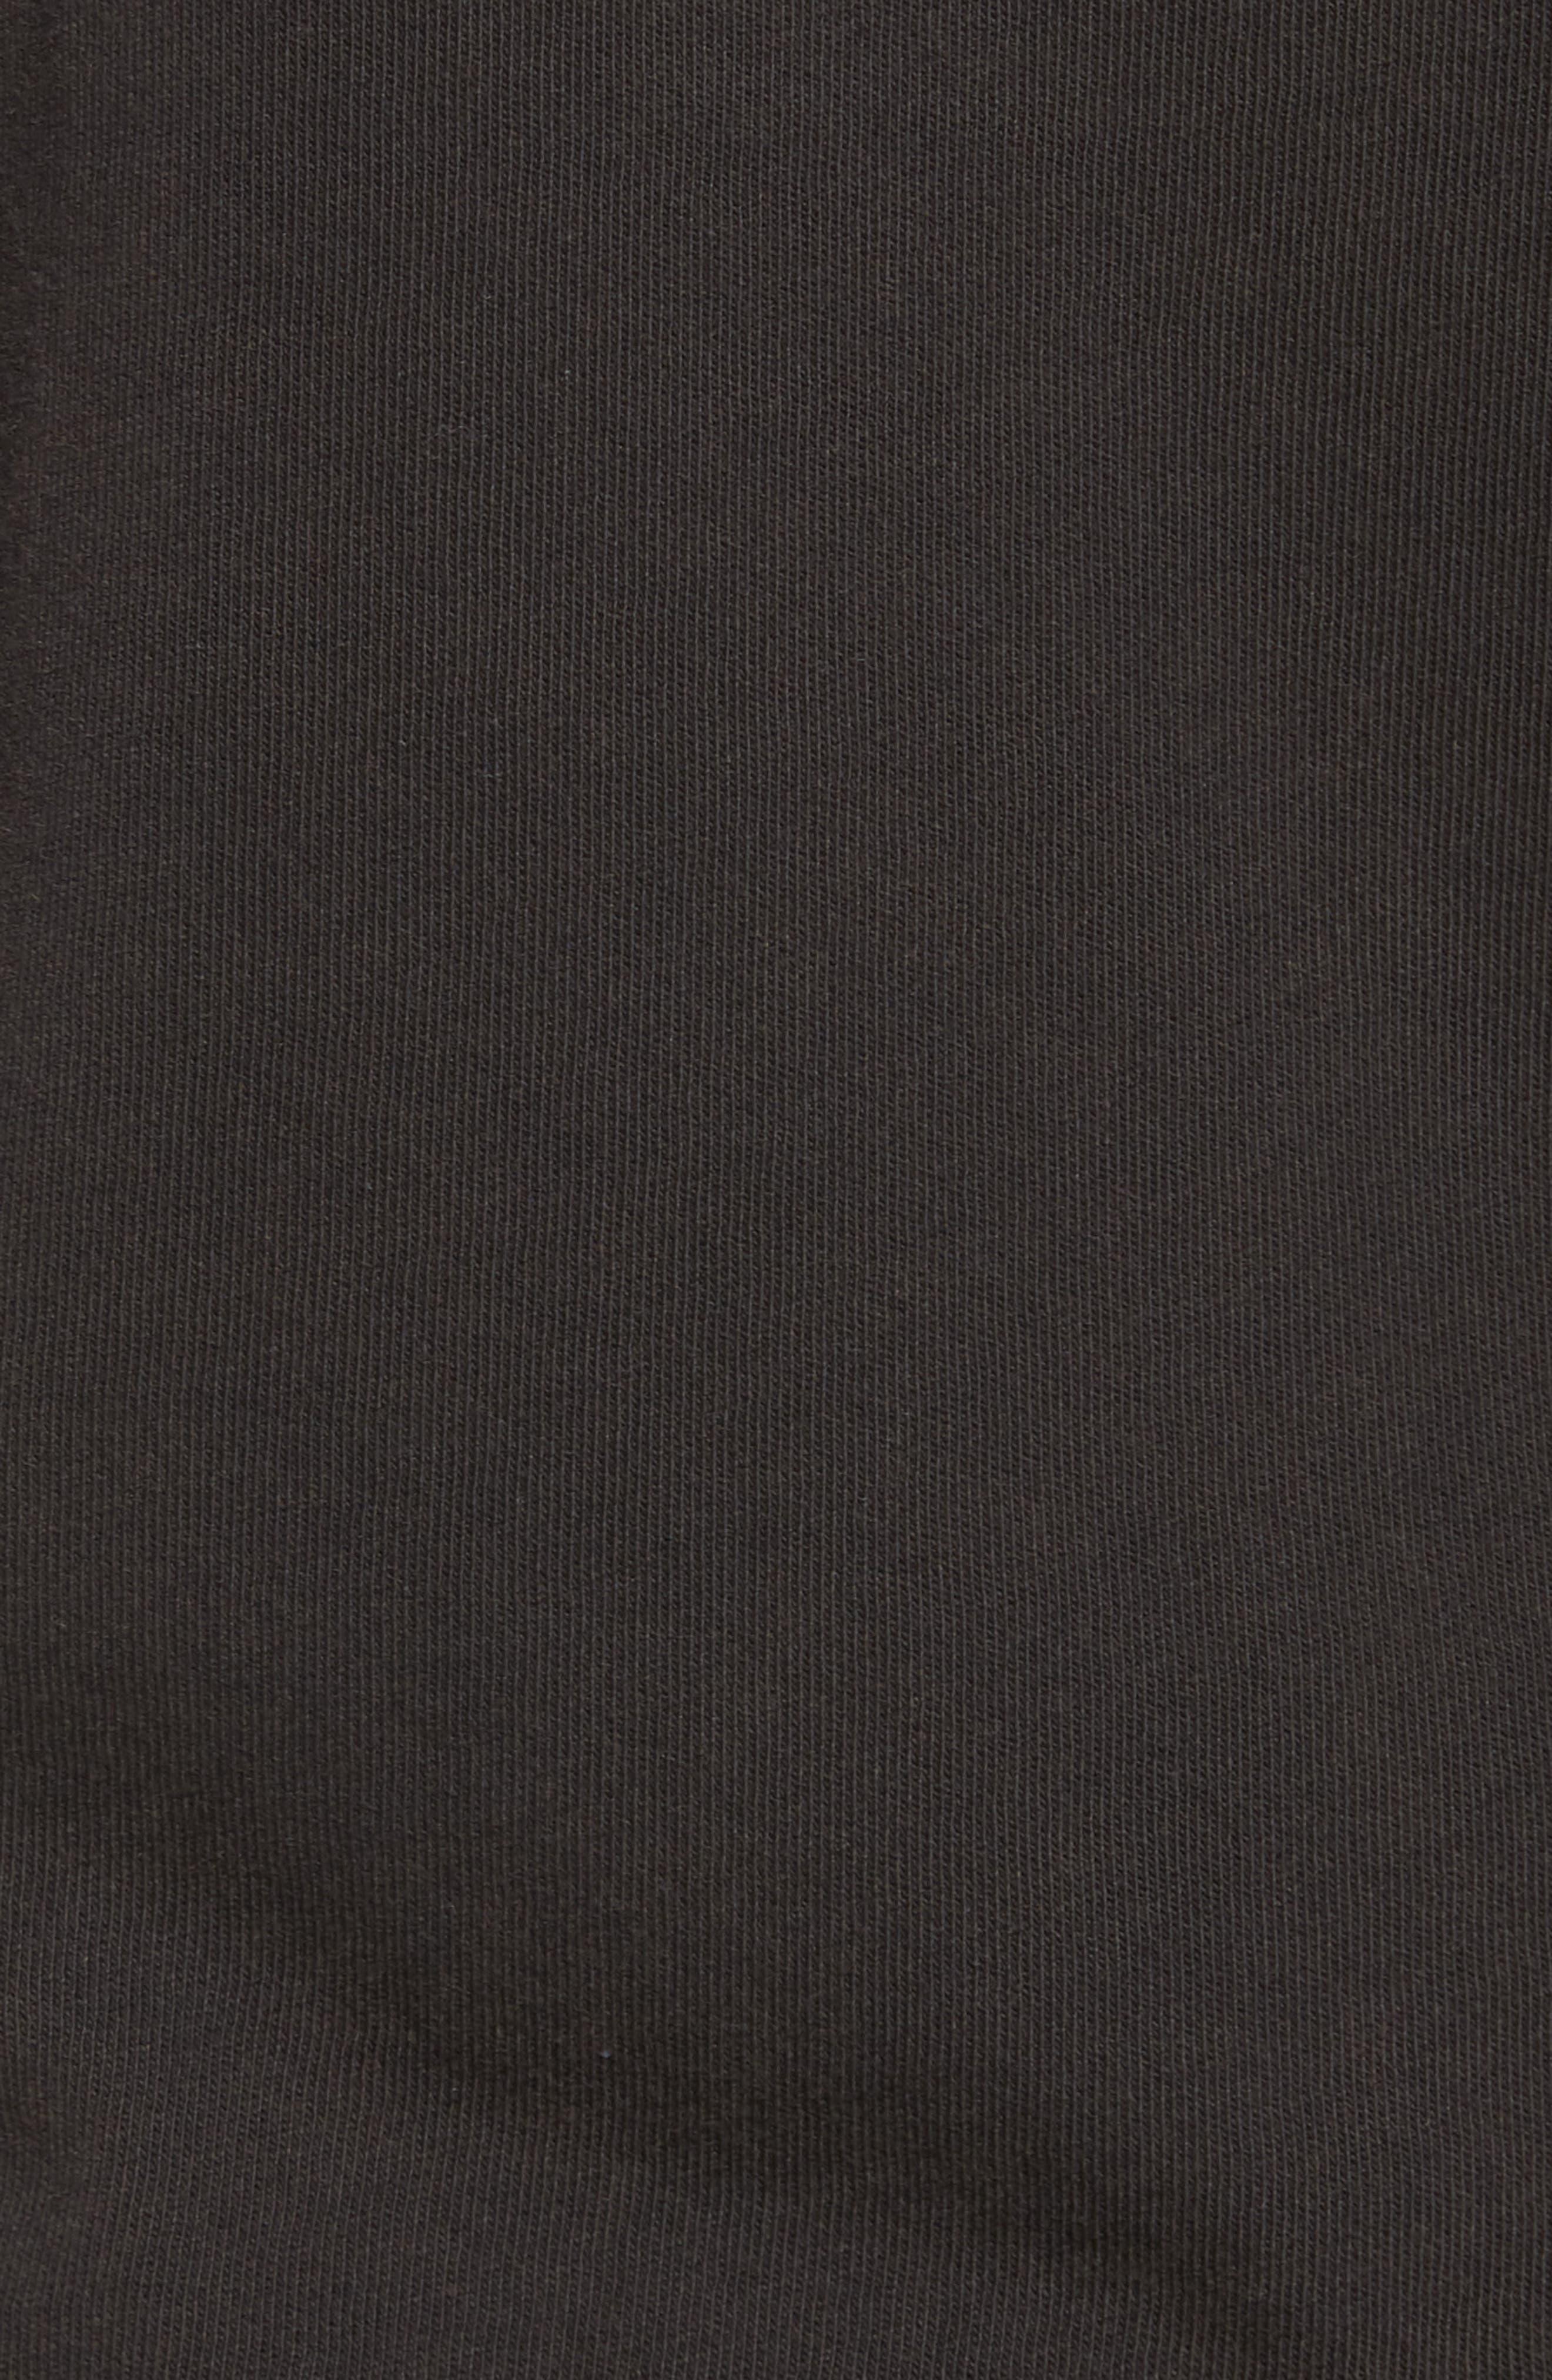 John Varvatos x Nick Jonas Rock City Graphic T-Shirt,                             Alternate thumbnail 6, color,                             Black